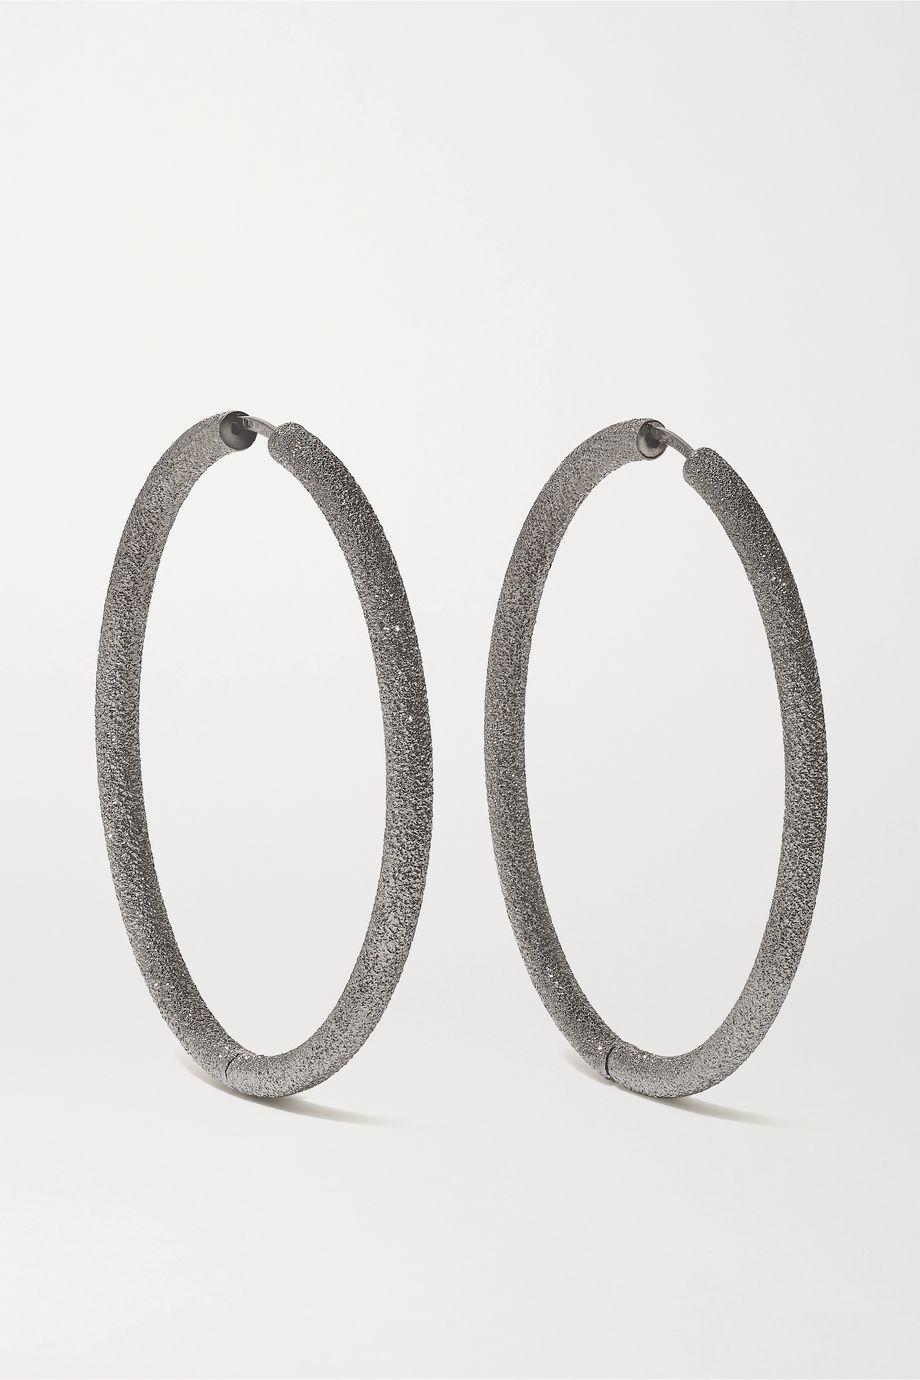 Carolina Bucci Florentine 18-karat blackened gold hoop earrings